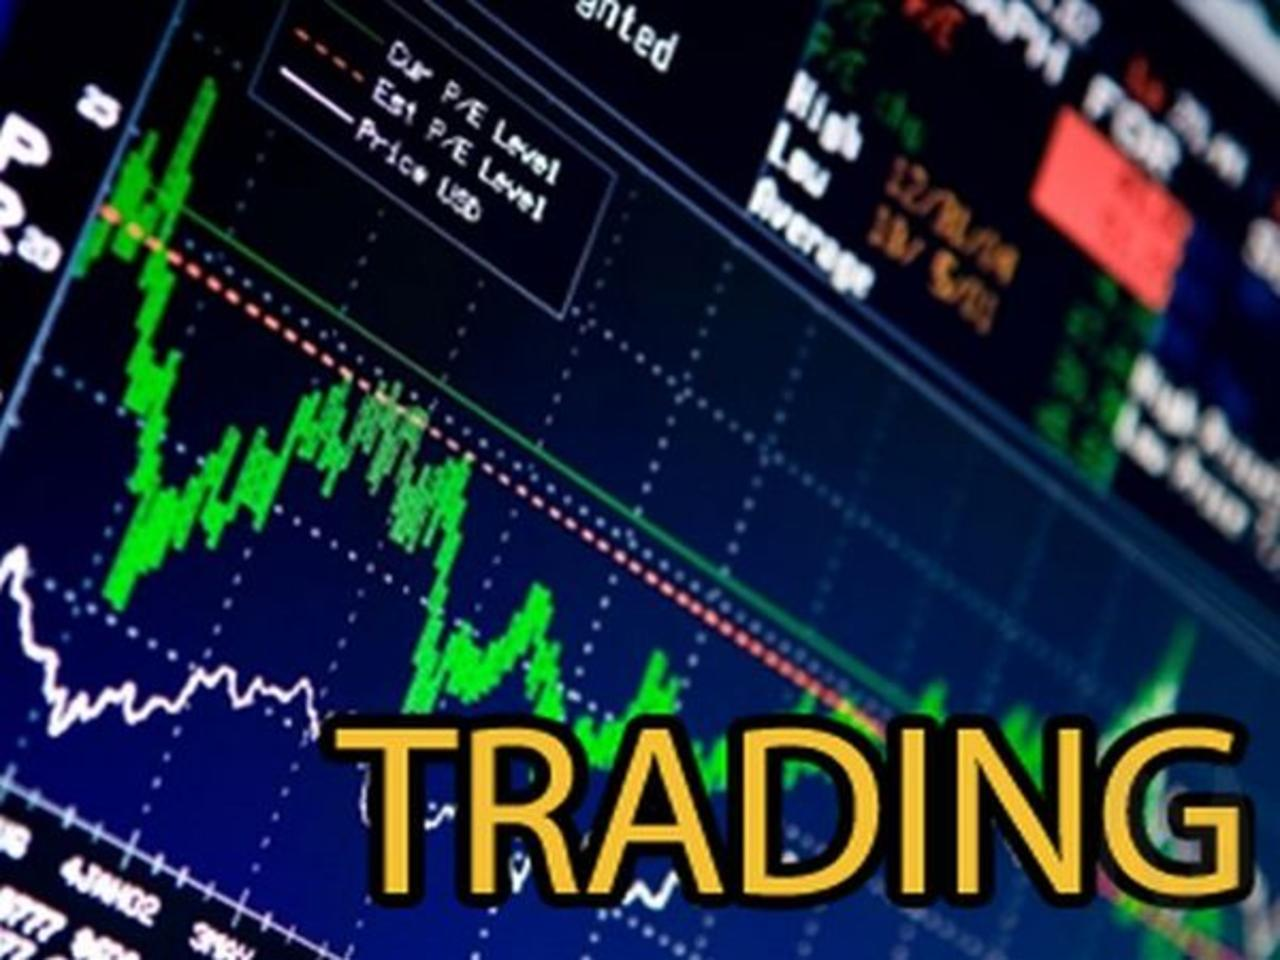 Tuesday 6/8 Insider Buying Report: BLI, MBWM